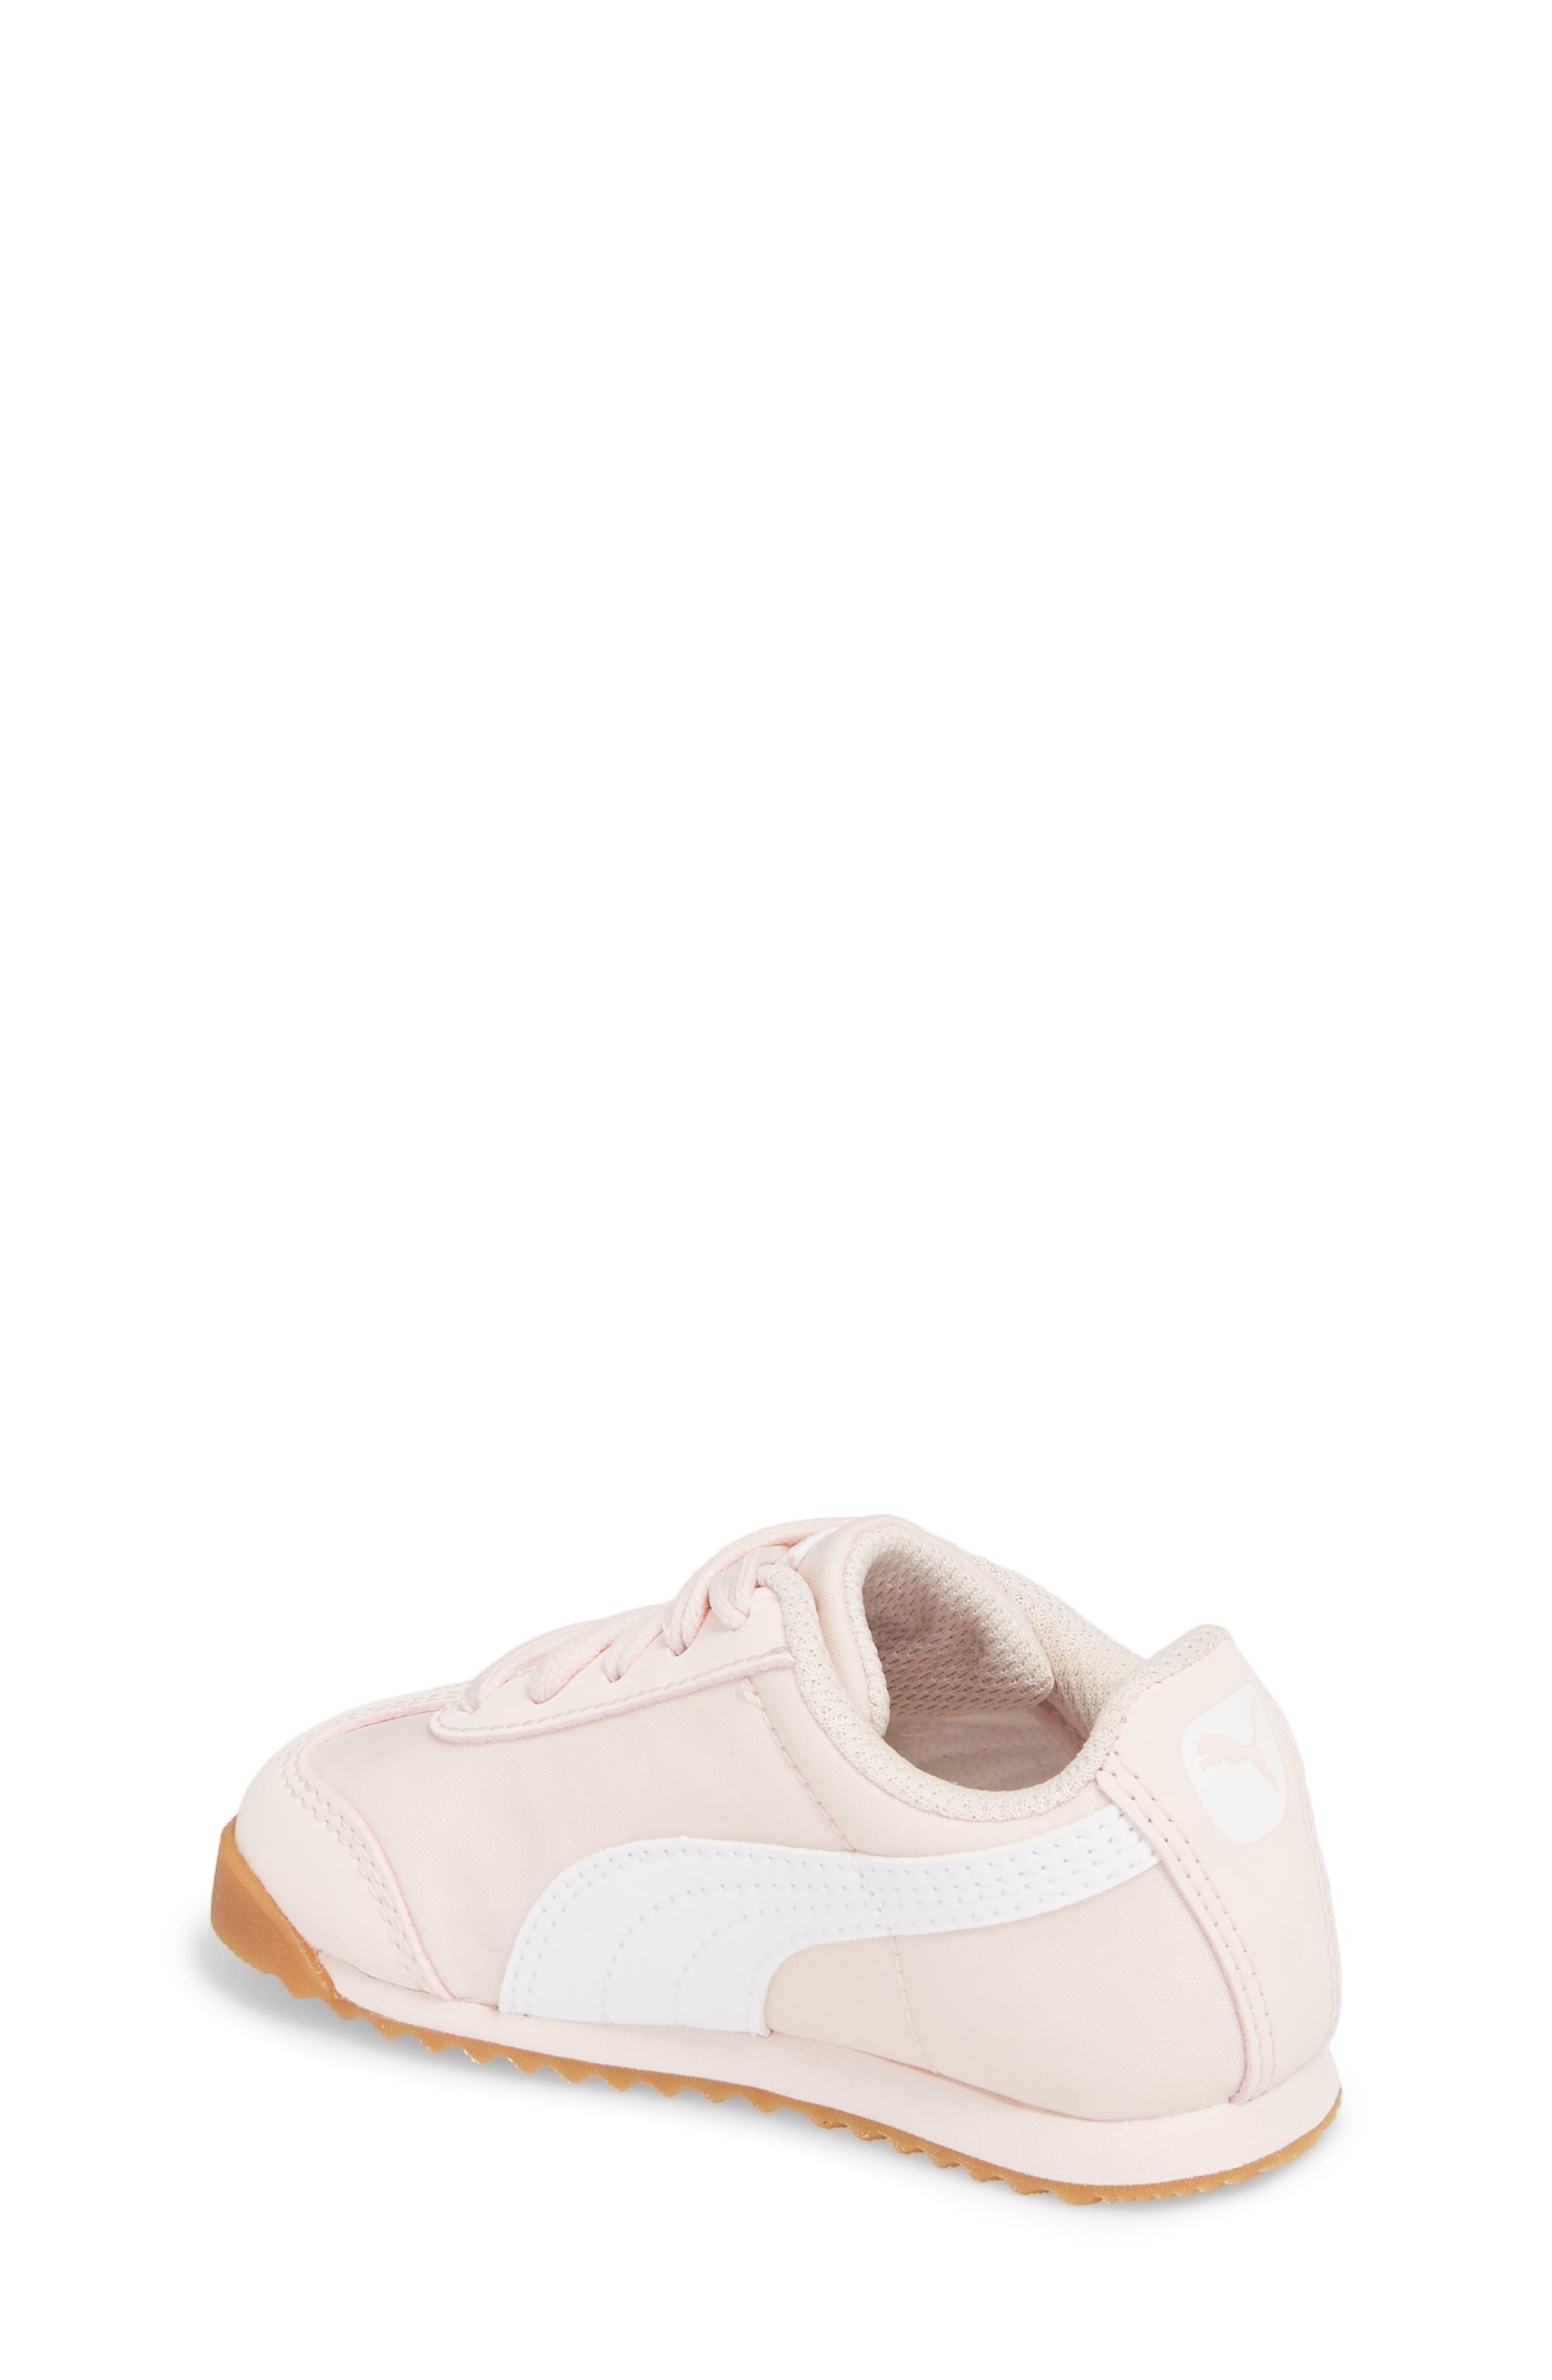 PUMA,                             Roma Basic Summer Sneaker,                             Alternate thumbnail 2, color,                             100